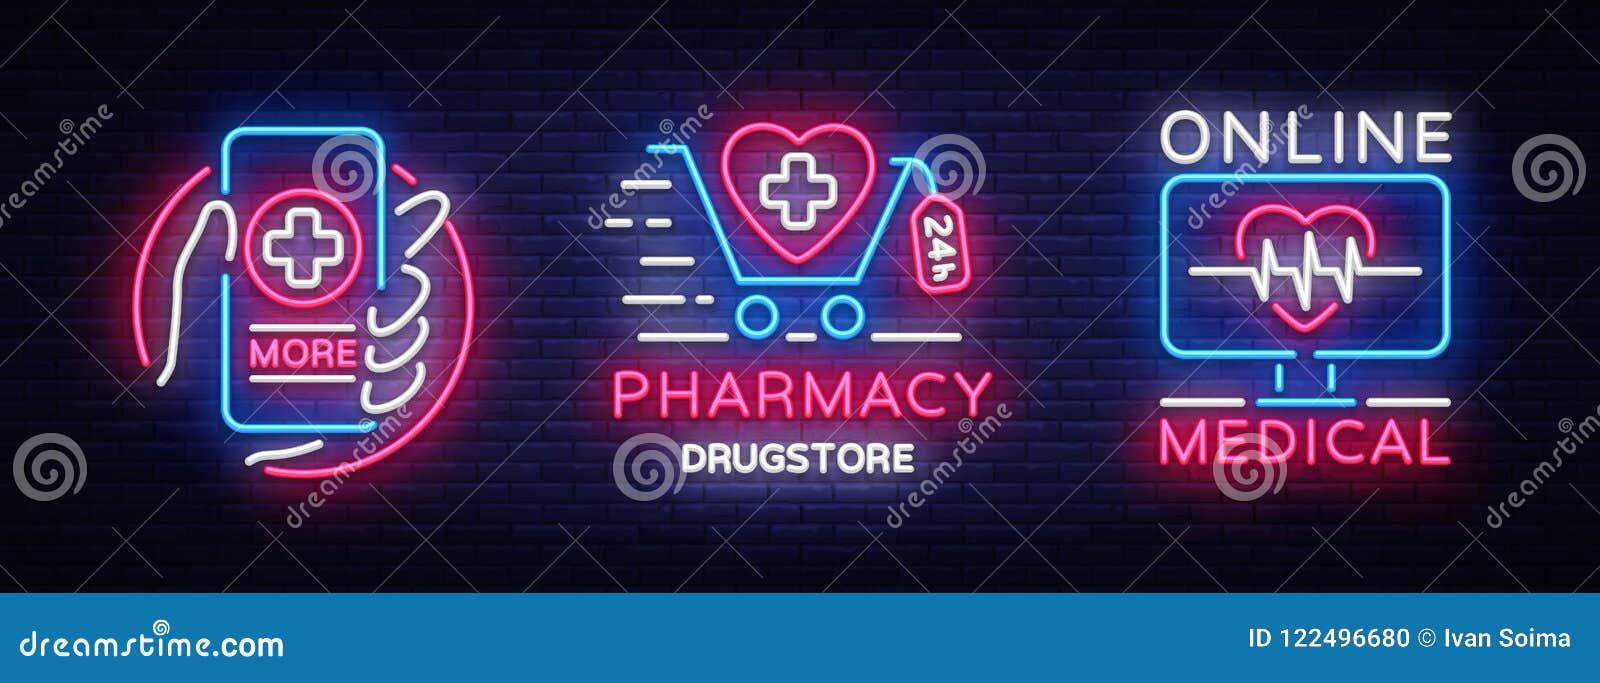 medical neon sign collection vector pharmacy design template neon